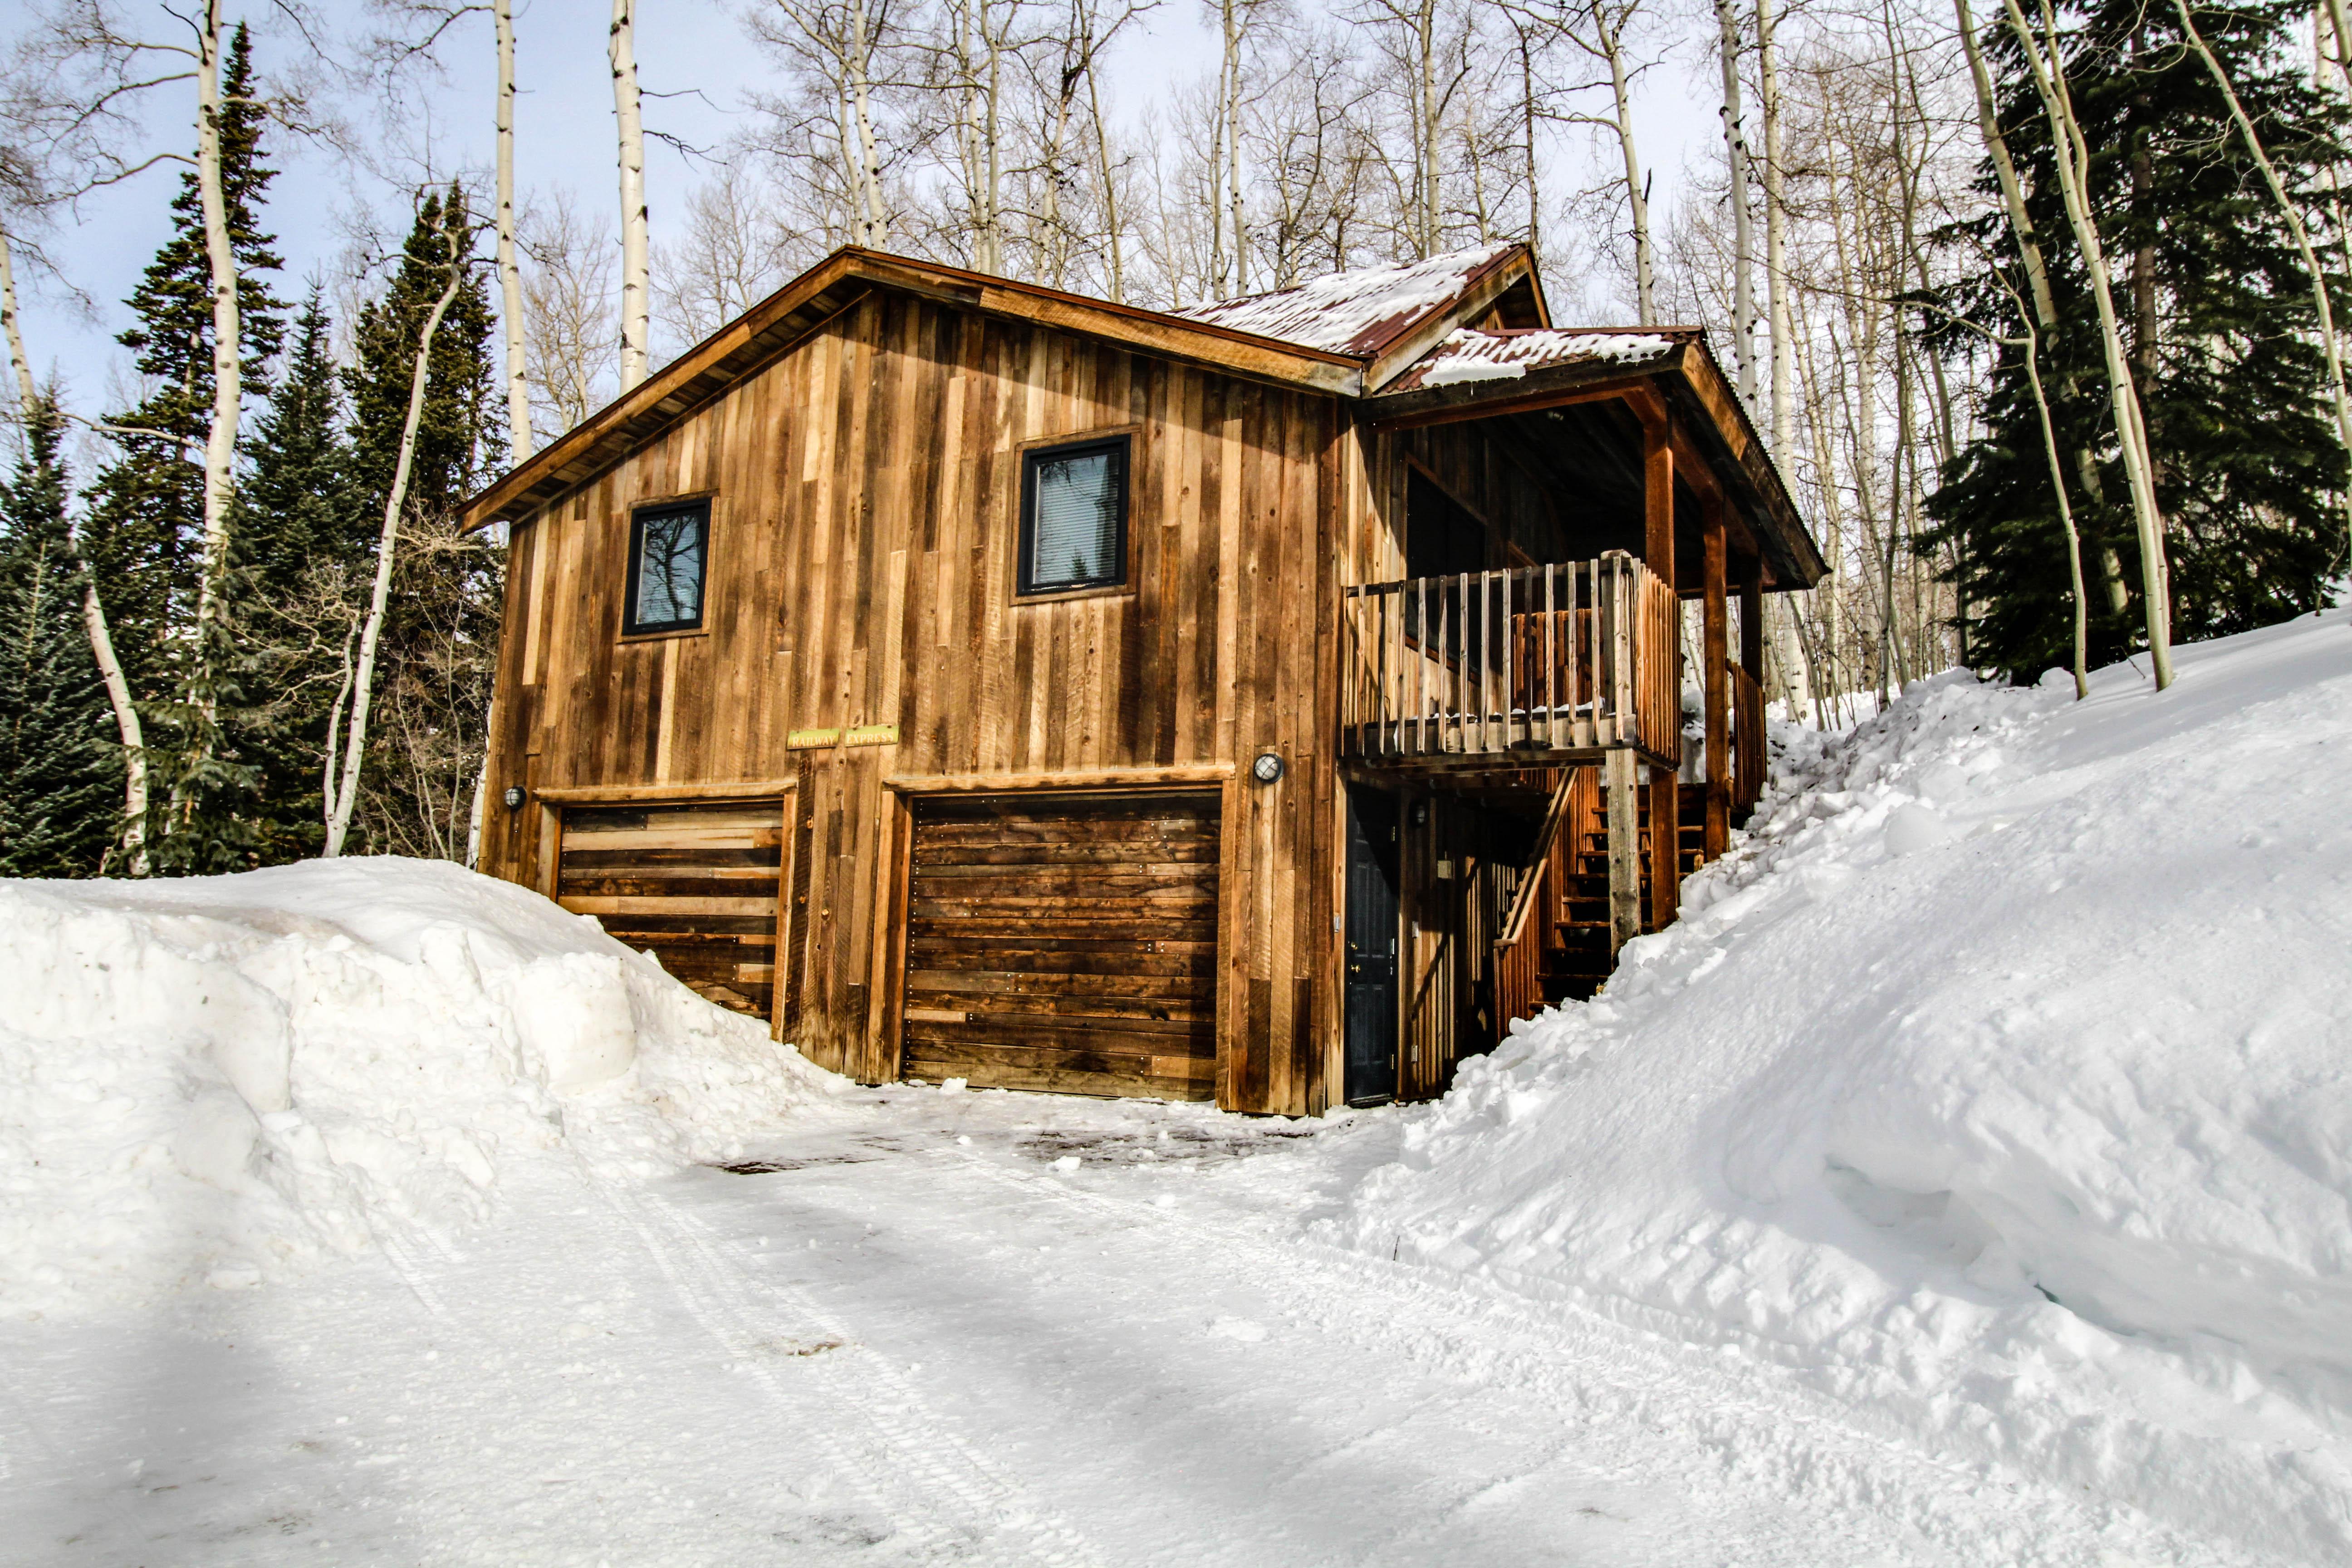 Wapiti Mountain Escape Guest Cabin | 2 BD Vacation Rental In Telluride, CO  | Vacasa